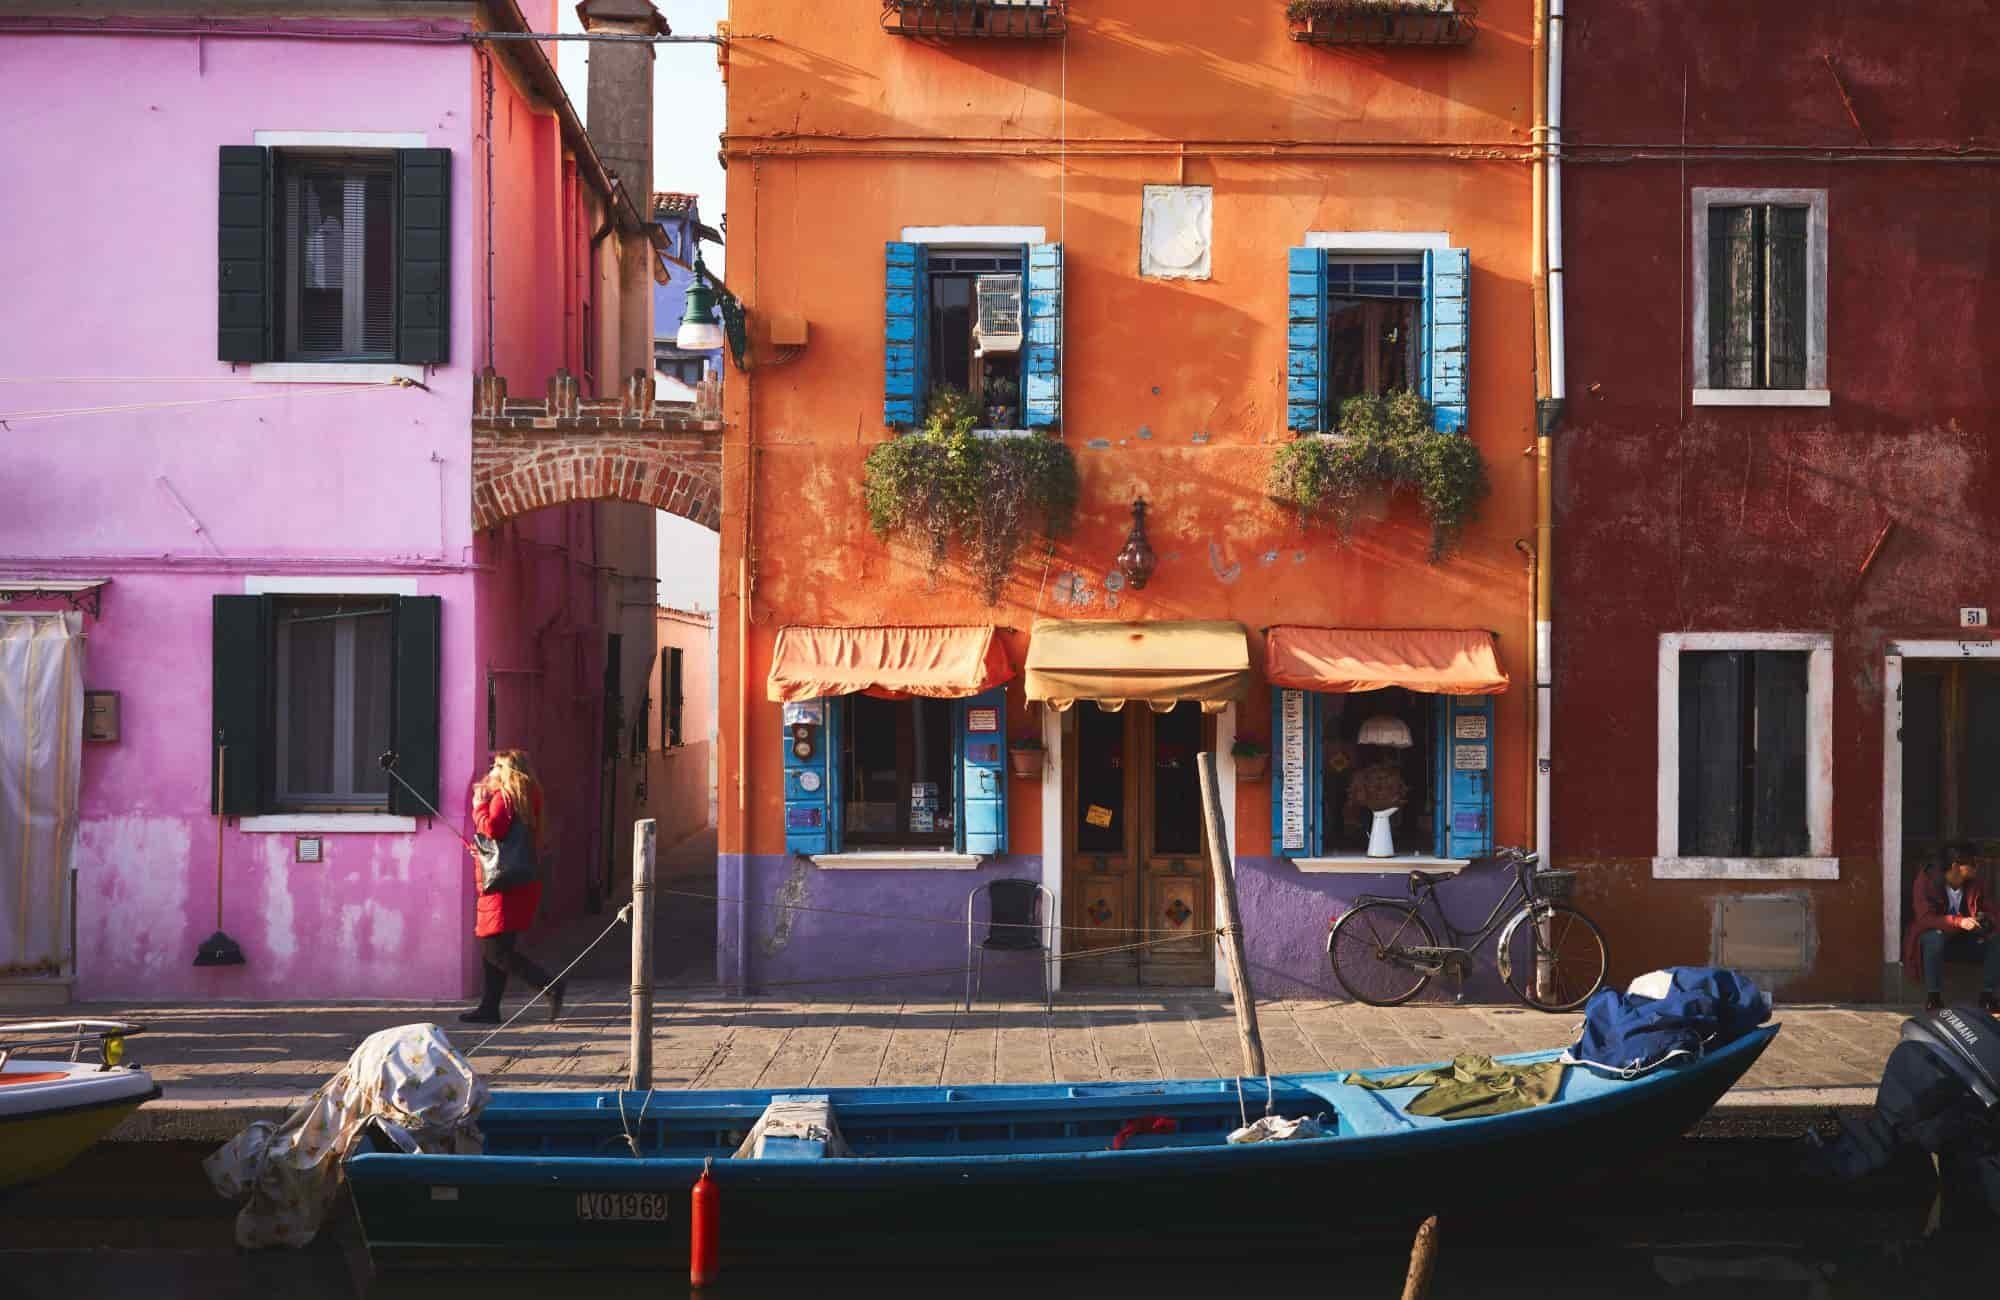 BURANO Italie - Recoup